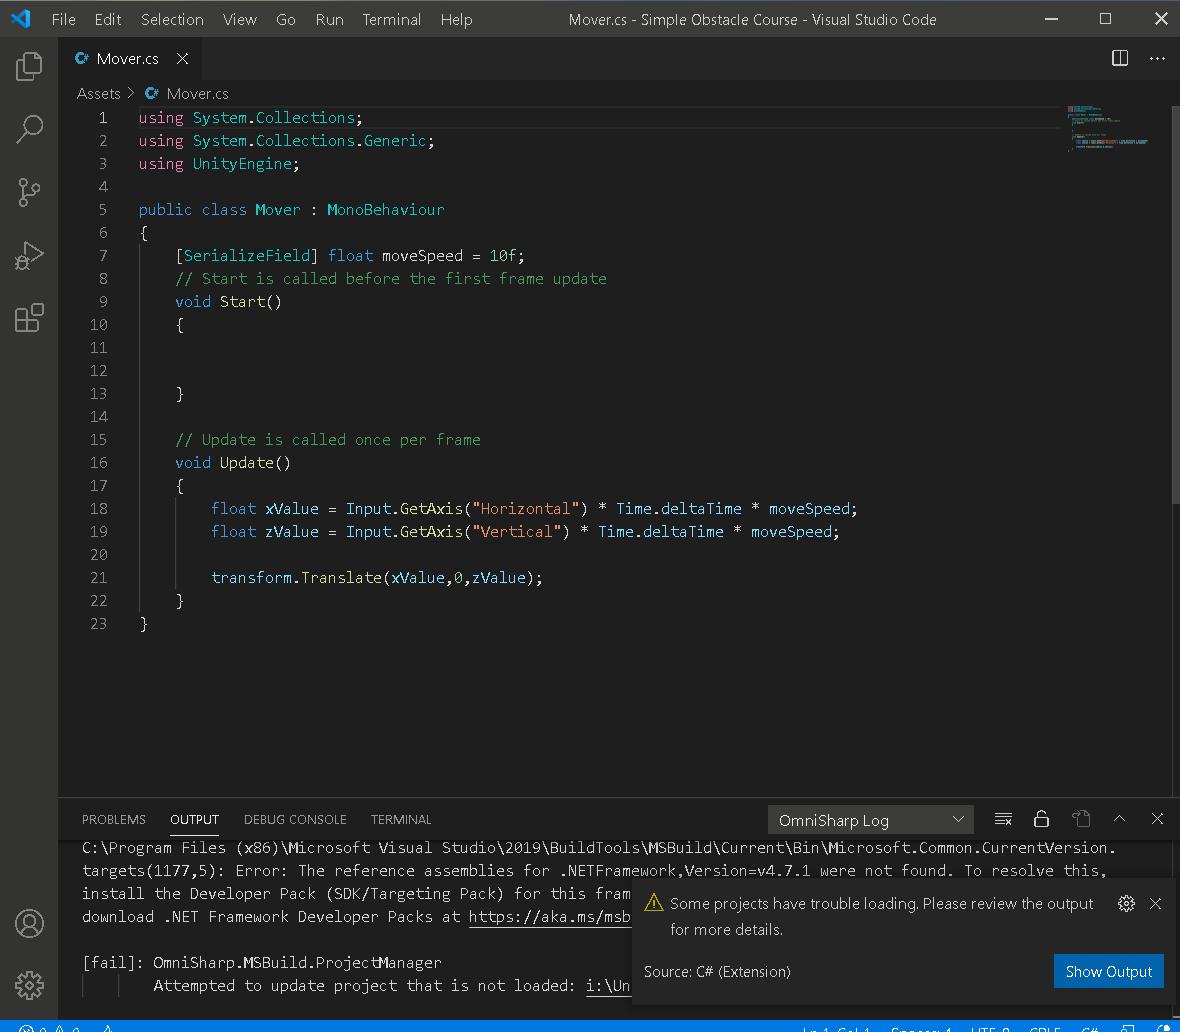 Visual Studio Code problem